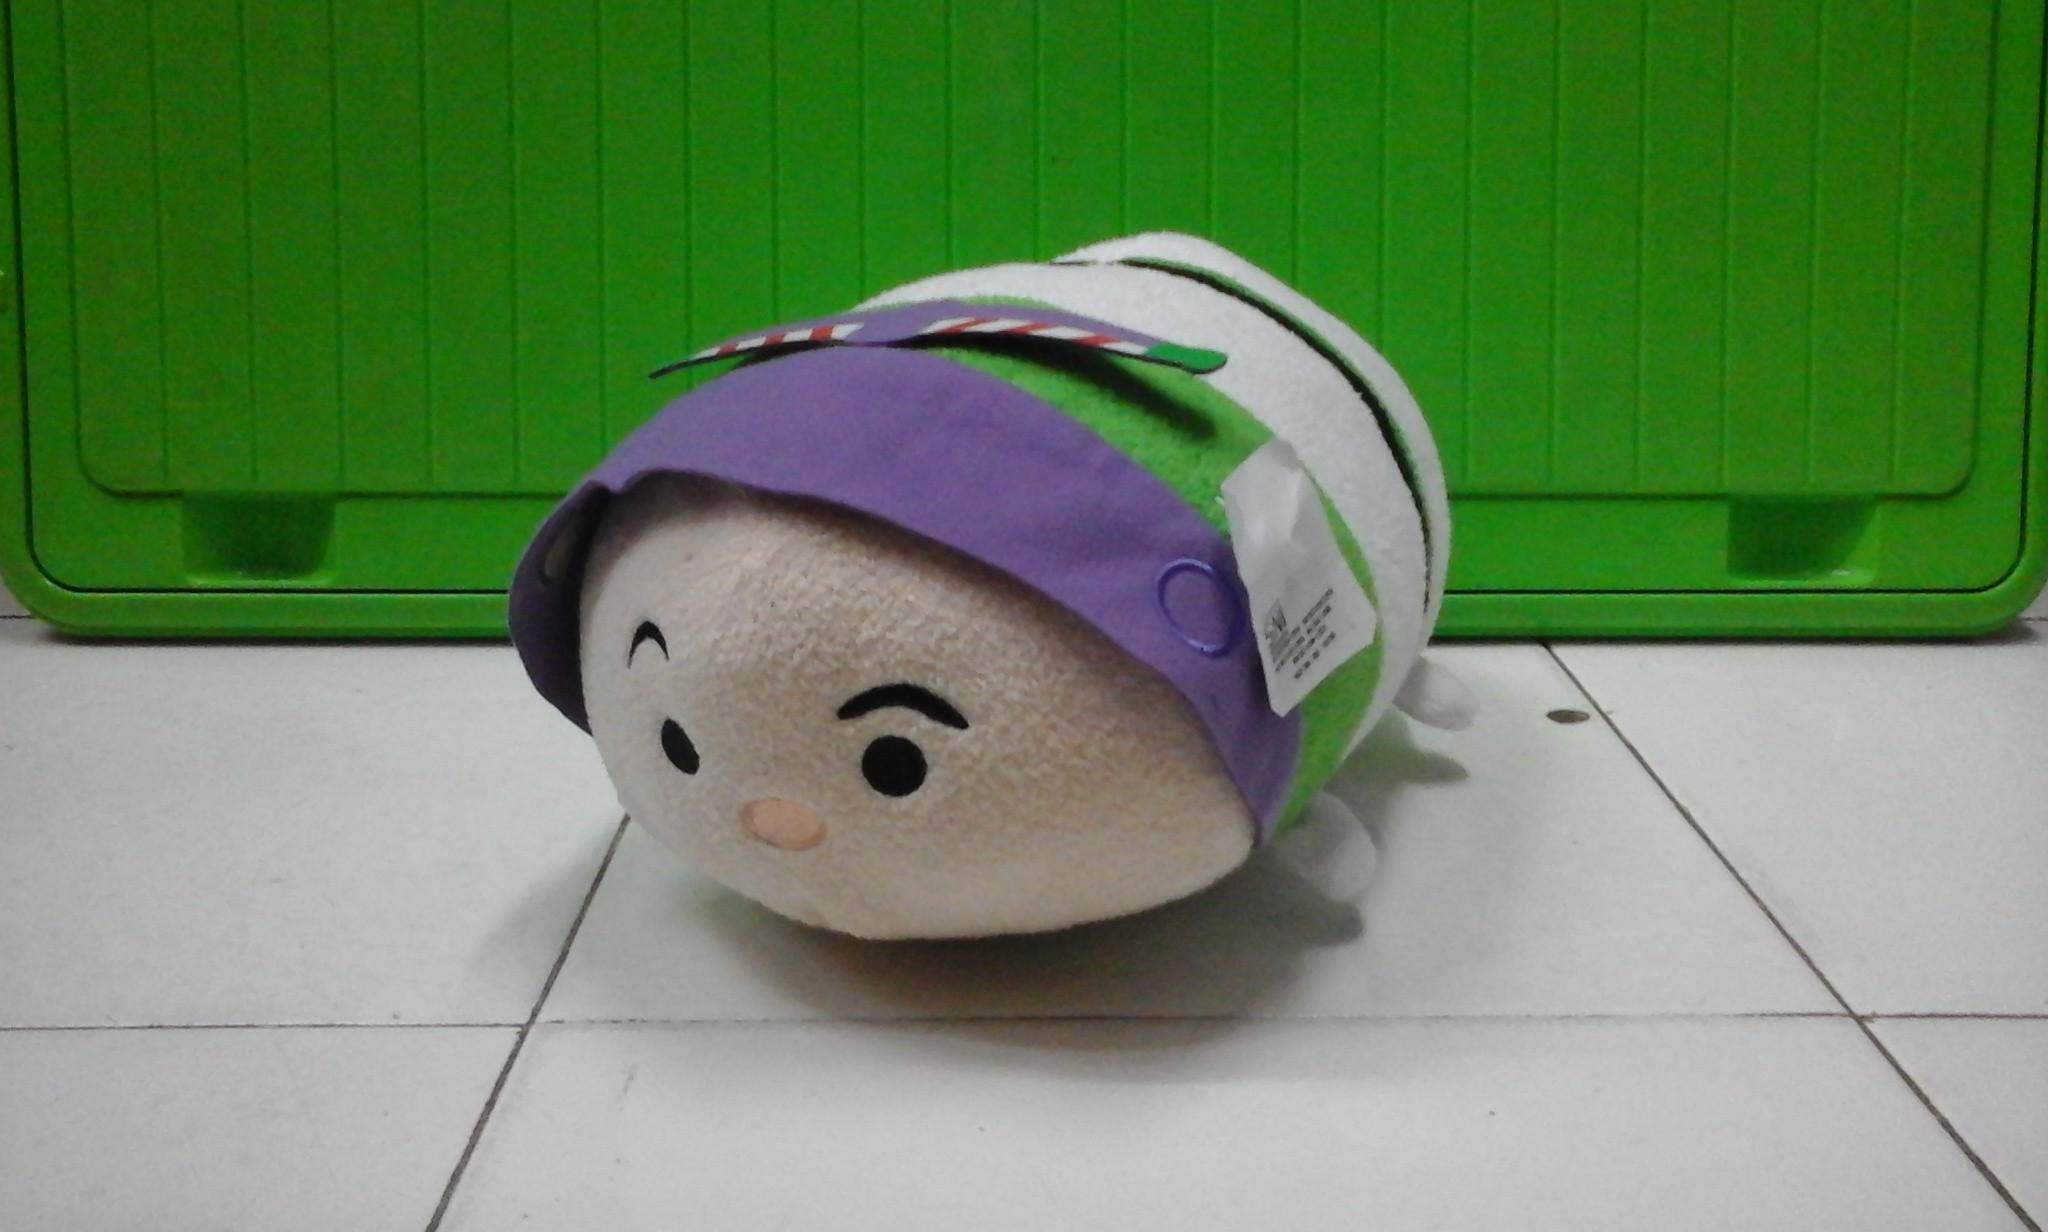 Disney Tsum Tsum Para Colorear Buzz Lightyear: Jual Boneka Disney Tsum Tsum Original